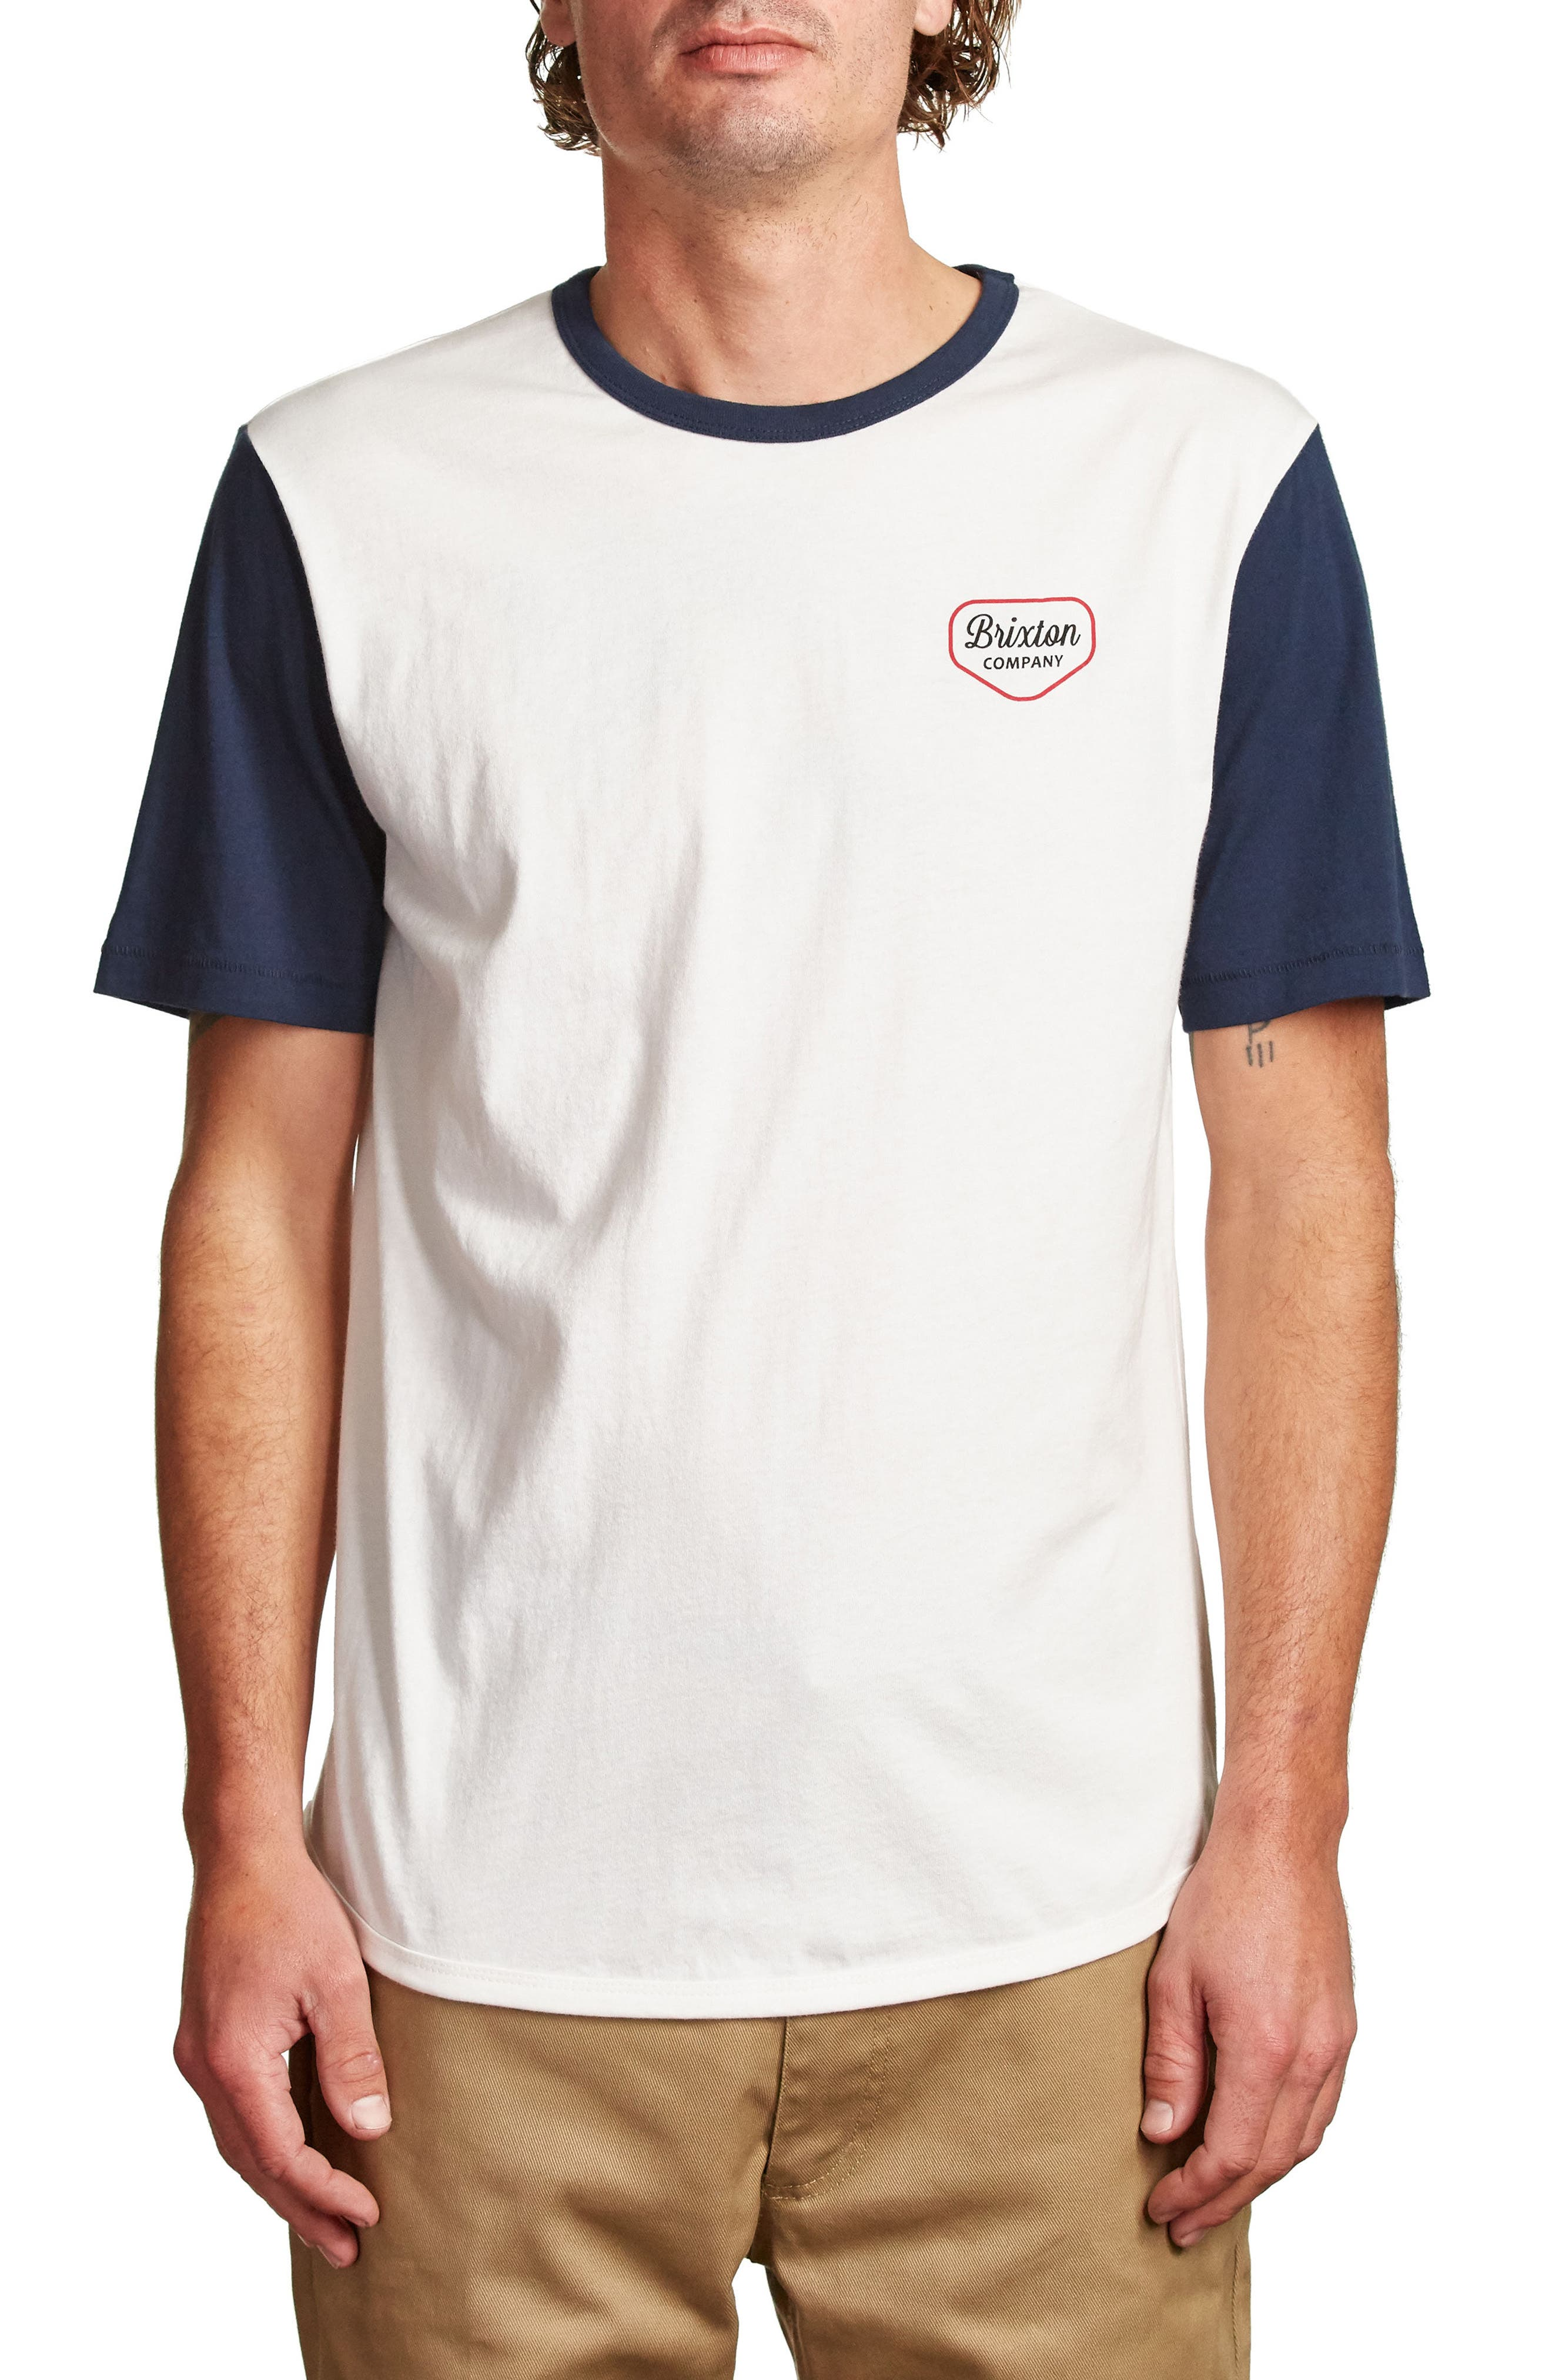 Novato T-Shirt,                         Main,                         color, Off White/ Navy